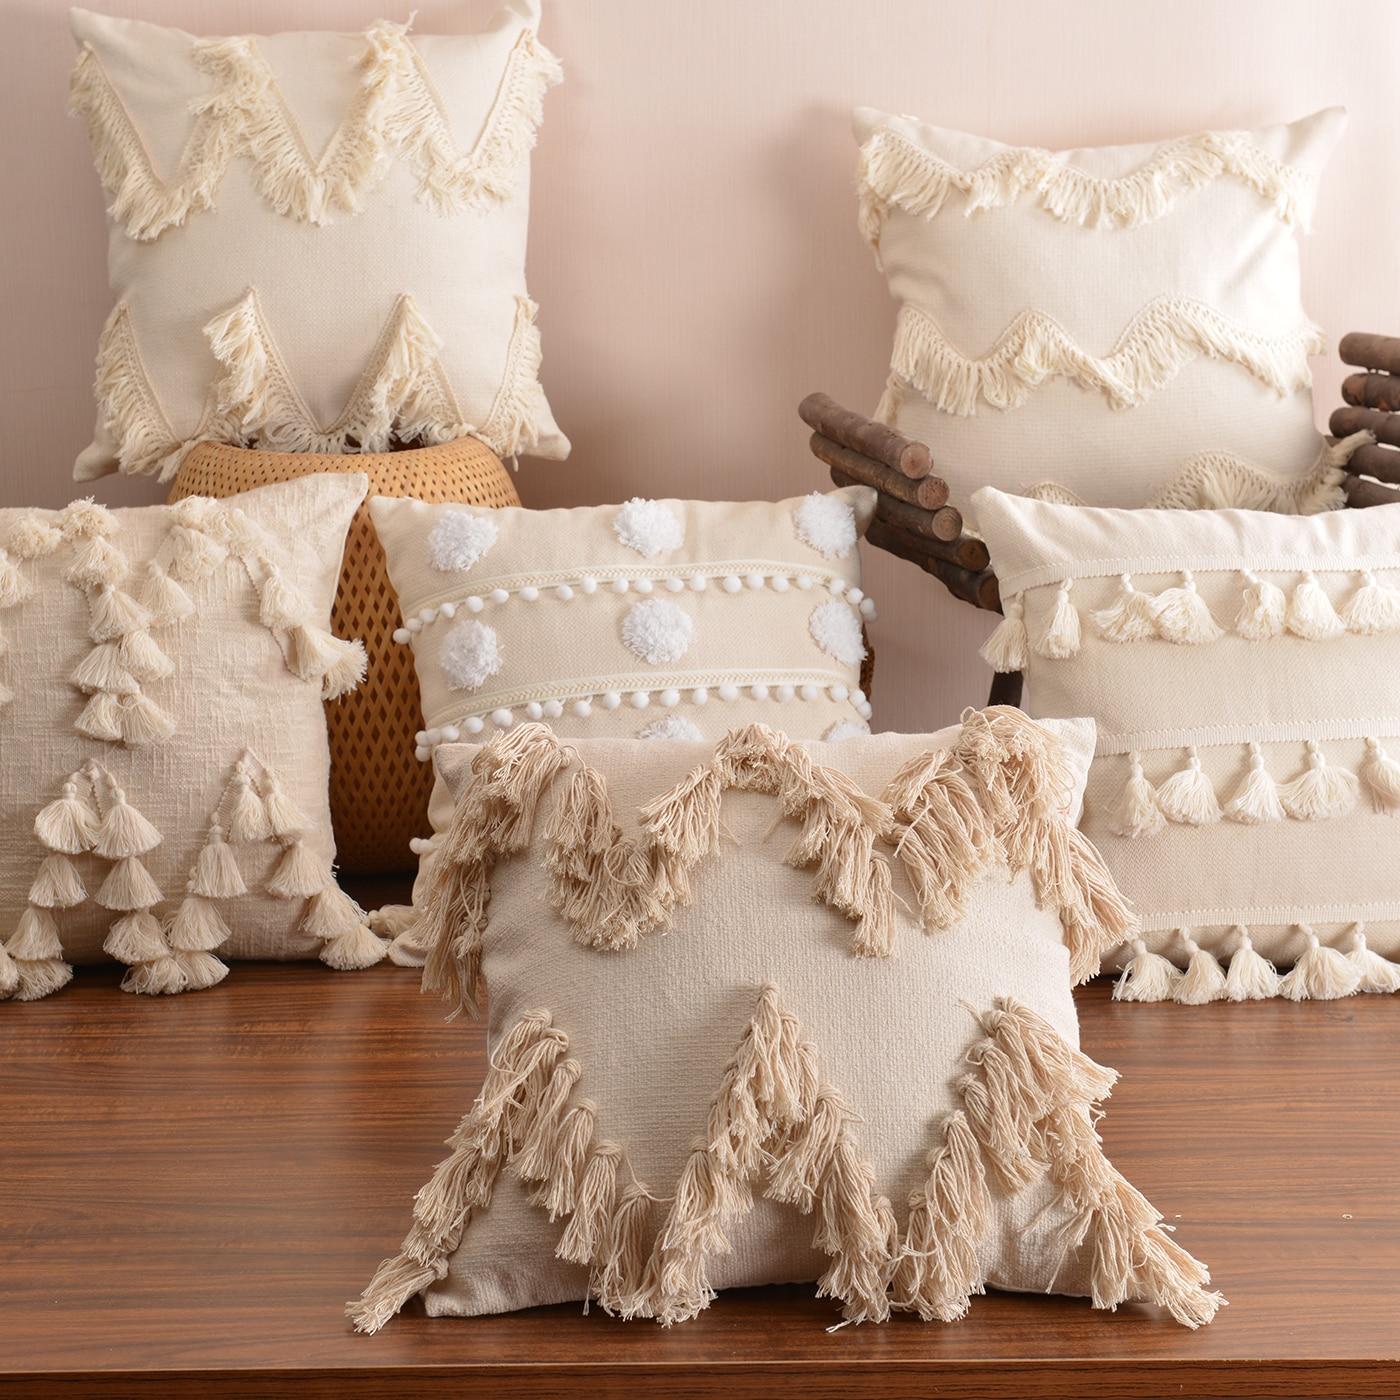 Estilo bohemio funda de cojín de felpa con borlas bonito círculo marroquí funda de cojín de estilo macramé hogar sofá decorativo drop shippng